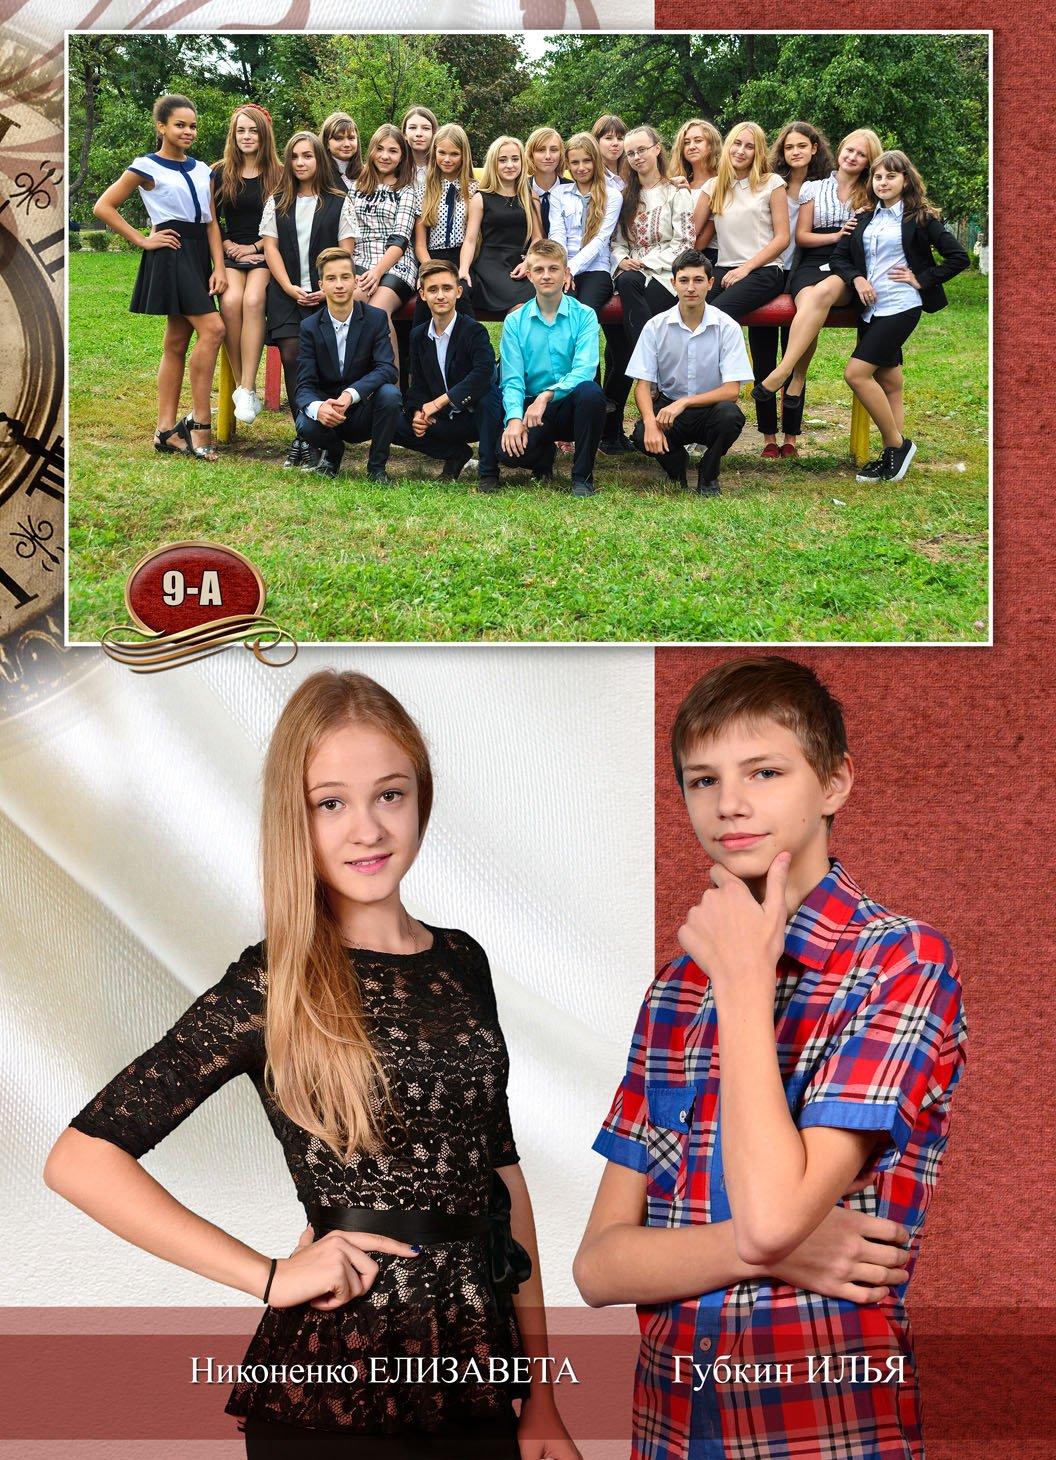 https://school-photo.com.ua/wp-content/uploads/2017/07/10-8.jpg